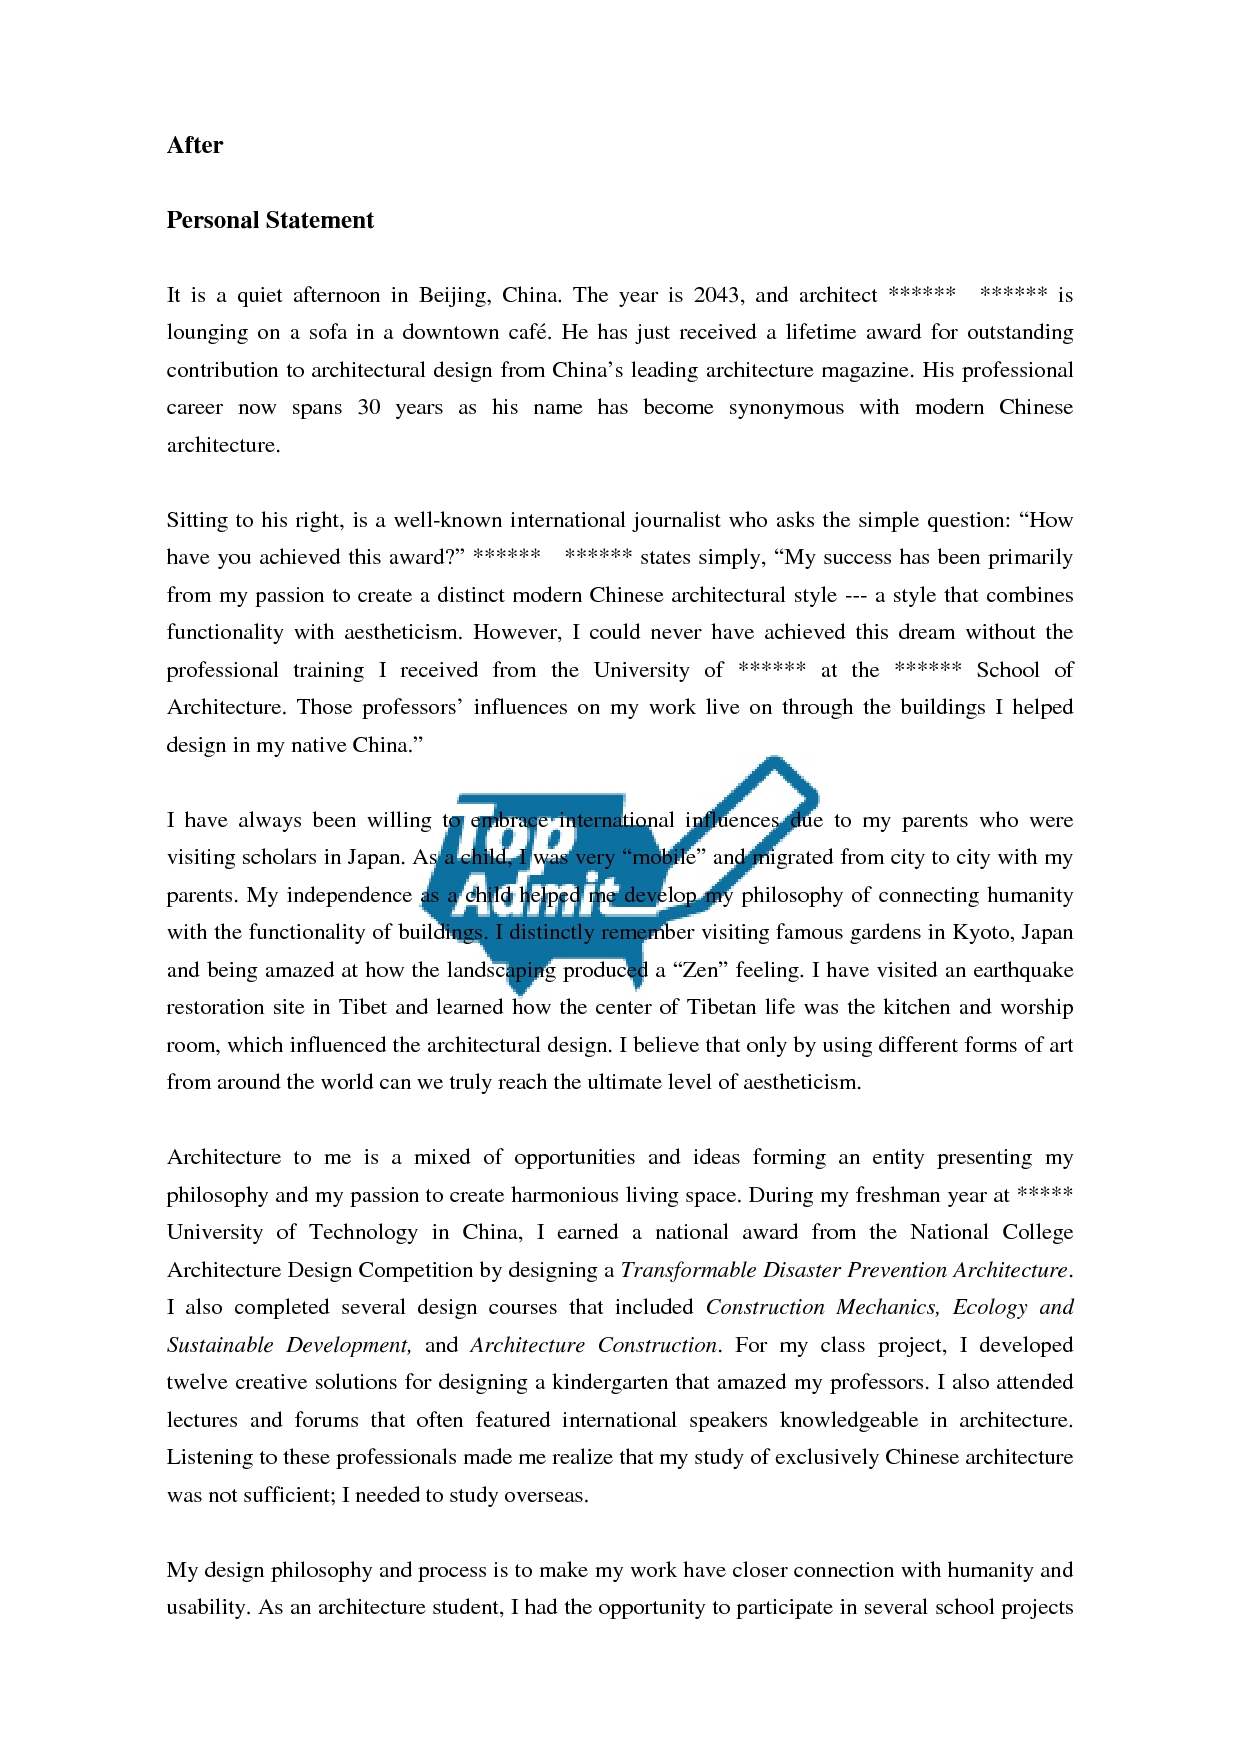 026 Zwjgmmd Common App Examples Best Example Essays Application Essay Harvard Prompts 2014-15 Full